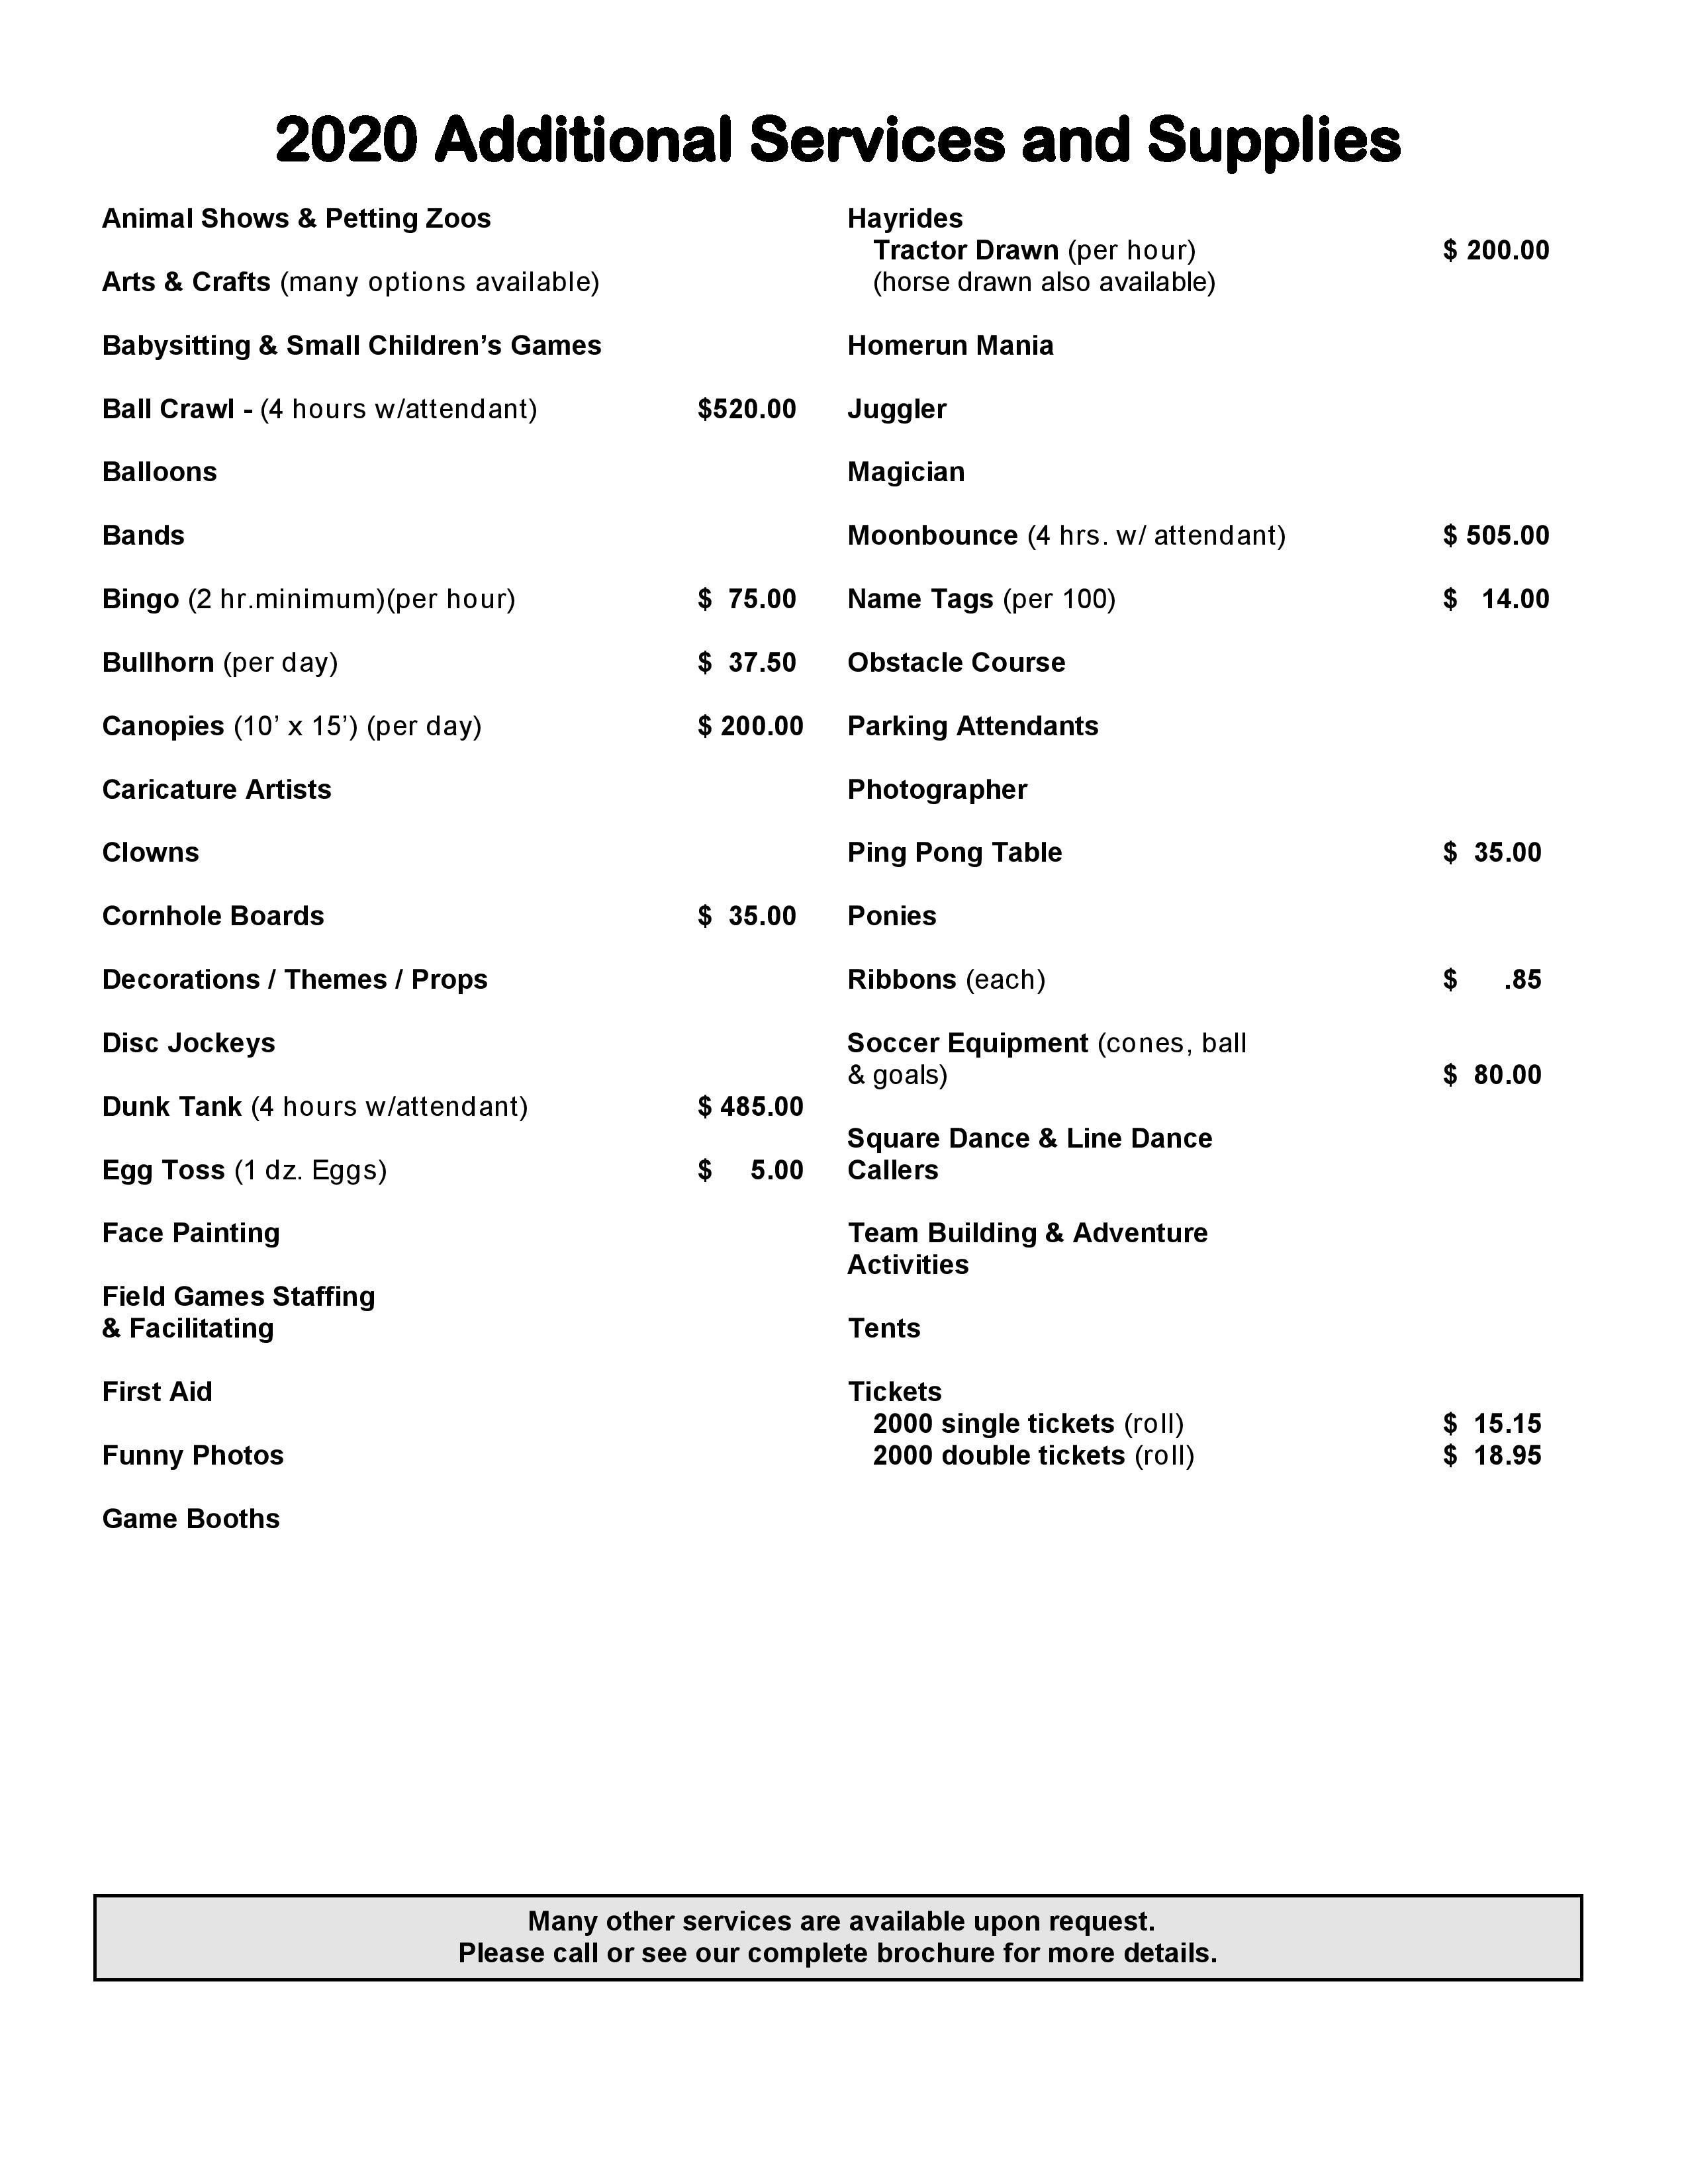 Additional Vendor Services